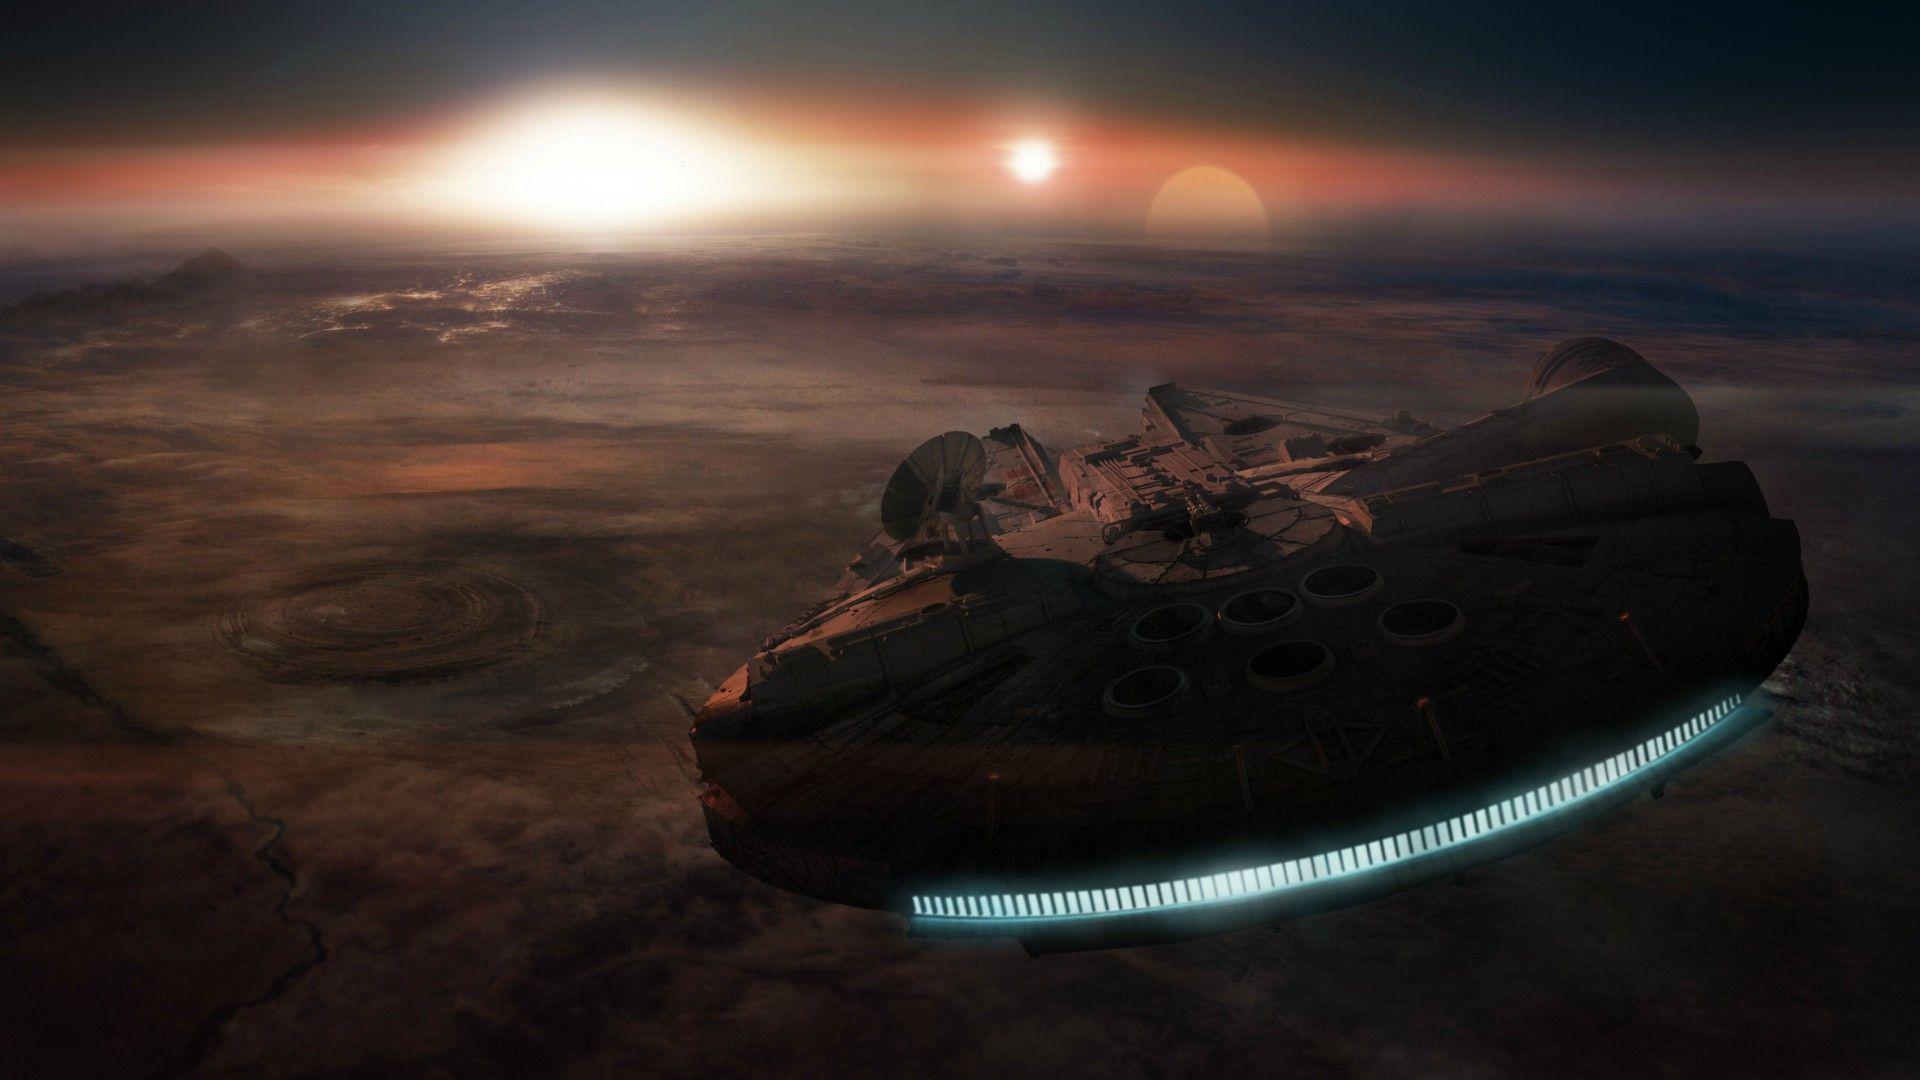 Star Wars 5k Wallpapers Top Free Star Wars 5k Backgrounds Wallpaperaccess